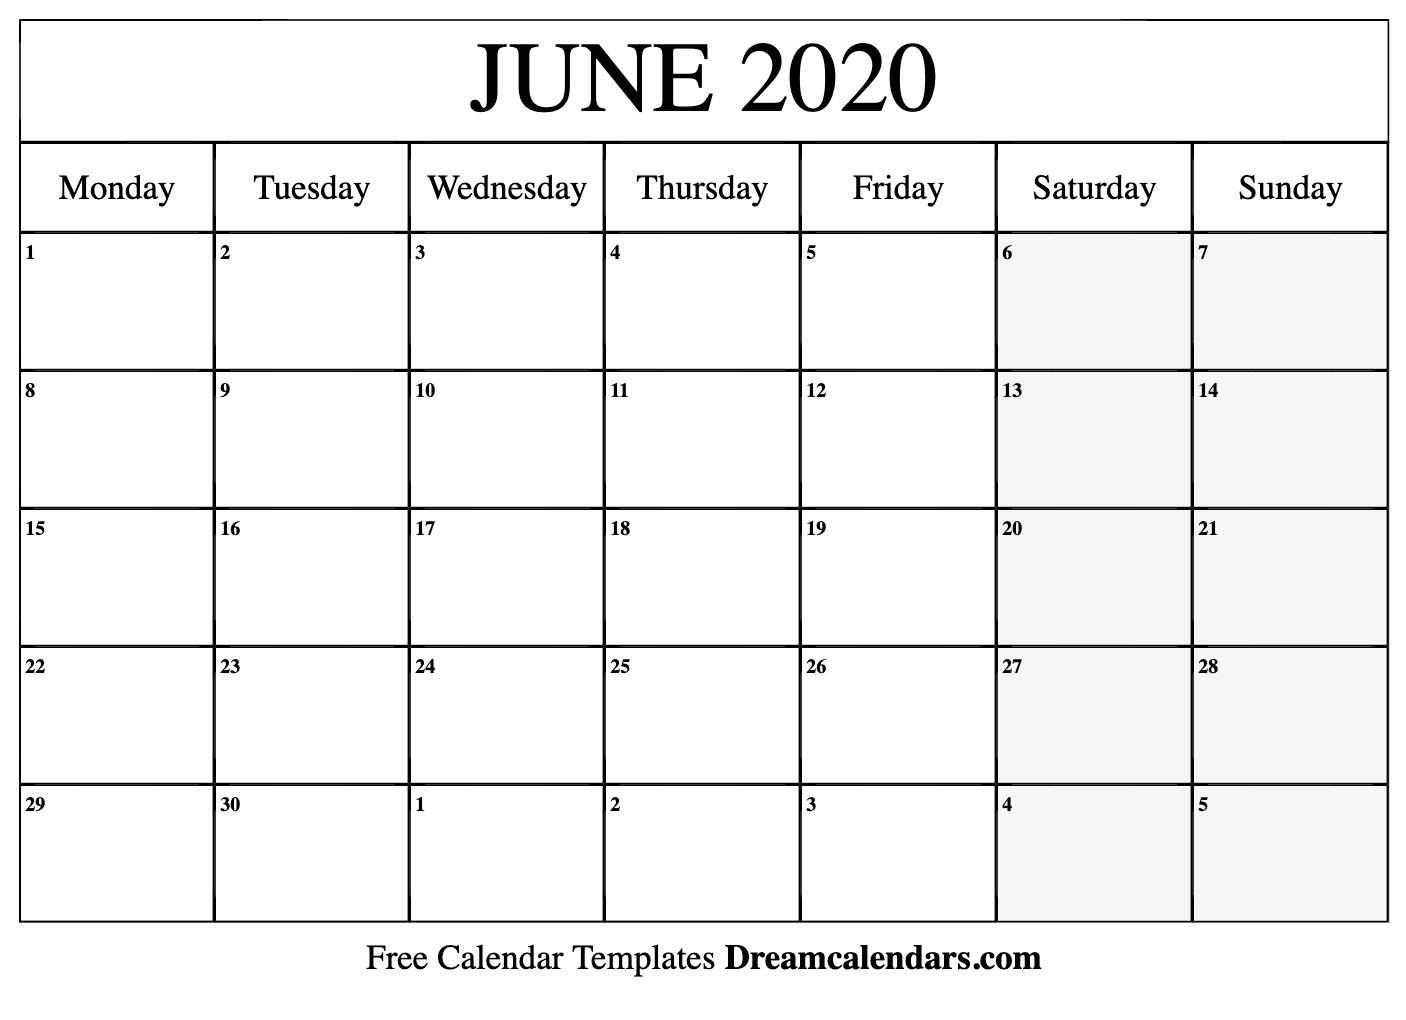 Printable June 2020 Calendar-Printable Monthly Calendar June 2020